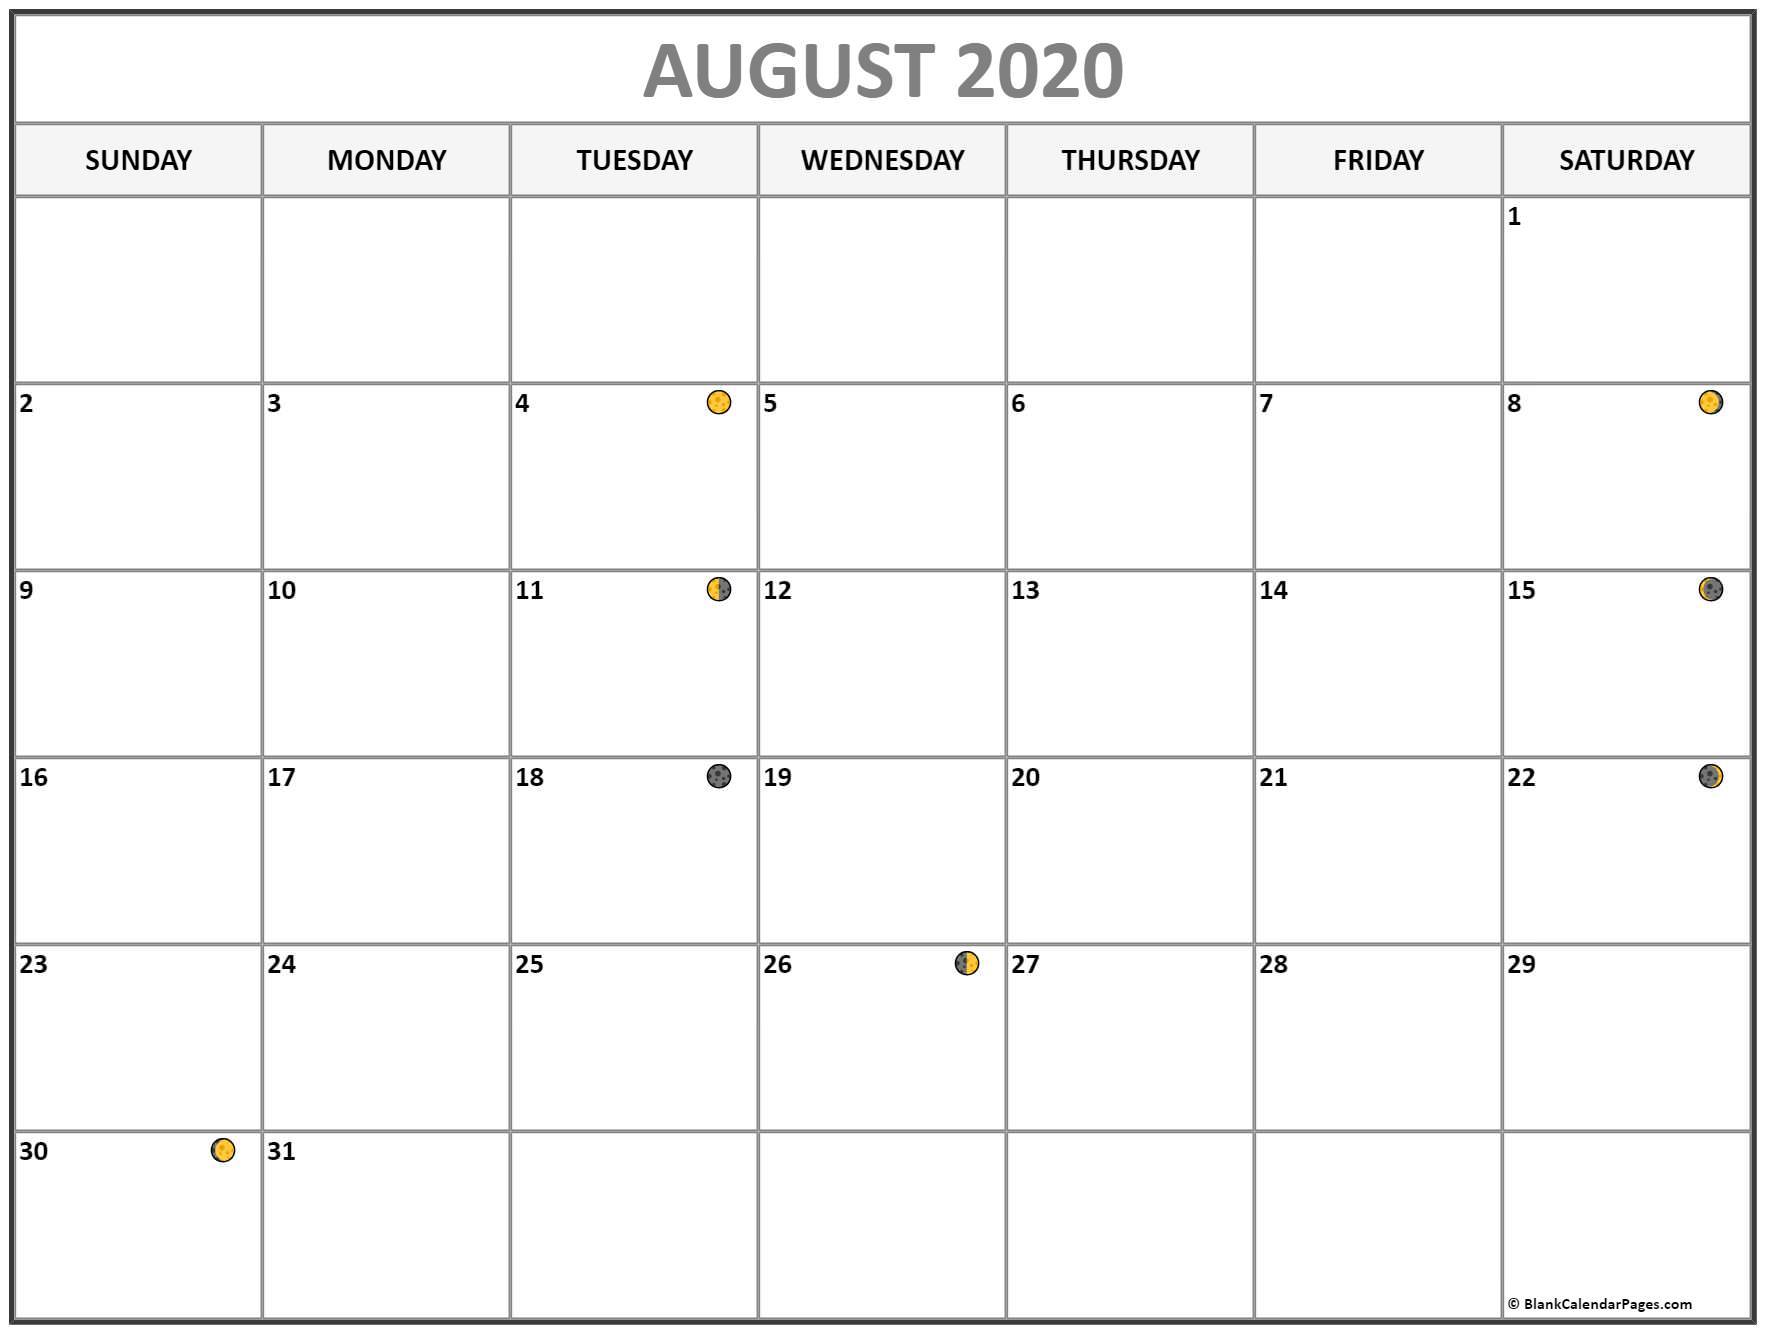 Printable August 2020 Moon Calendar